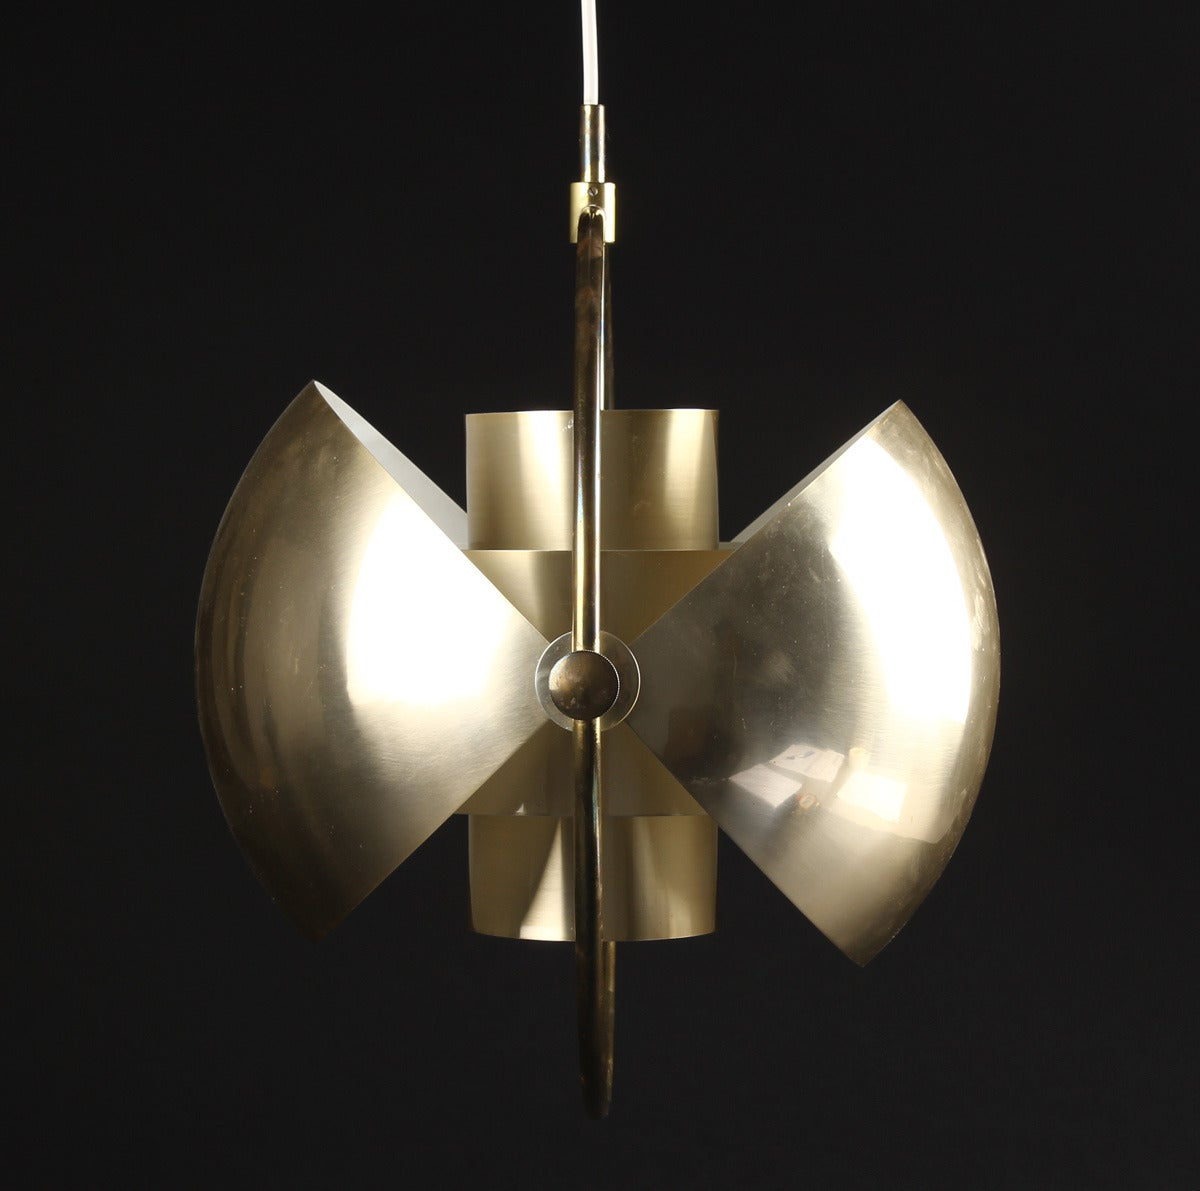 Scandinavian Modern Original Multi-Light Pendant by Louis Weisdorf for Lyfa/ 4 available For Sale